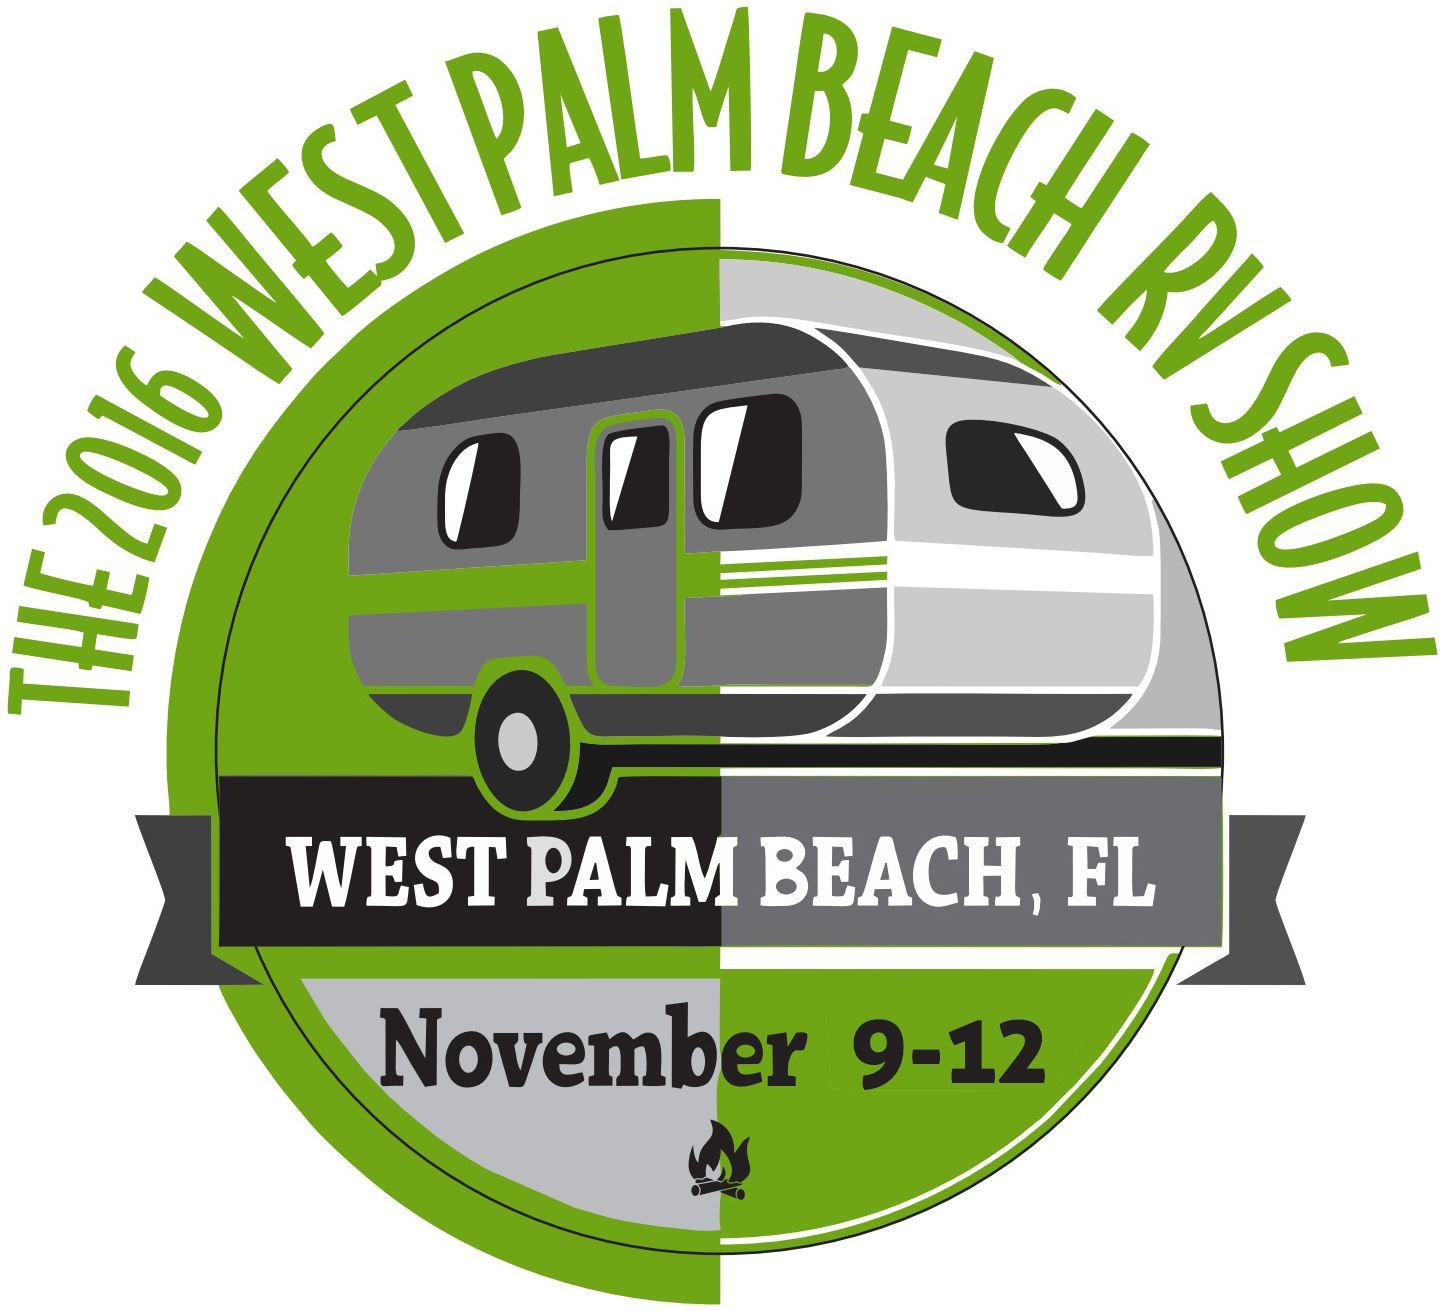 West Palm Beach RV Show